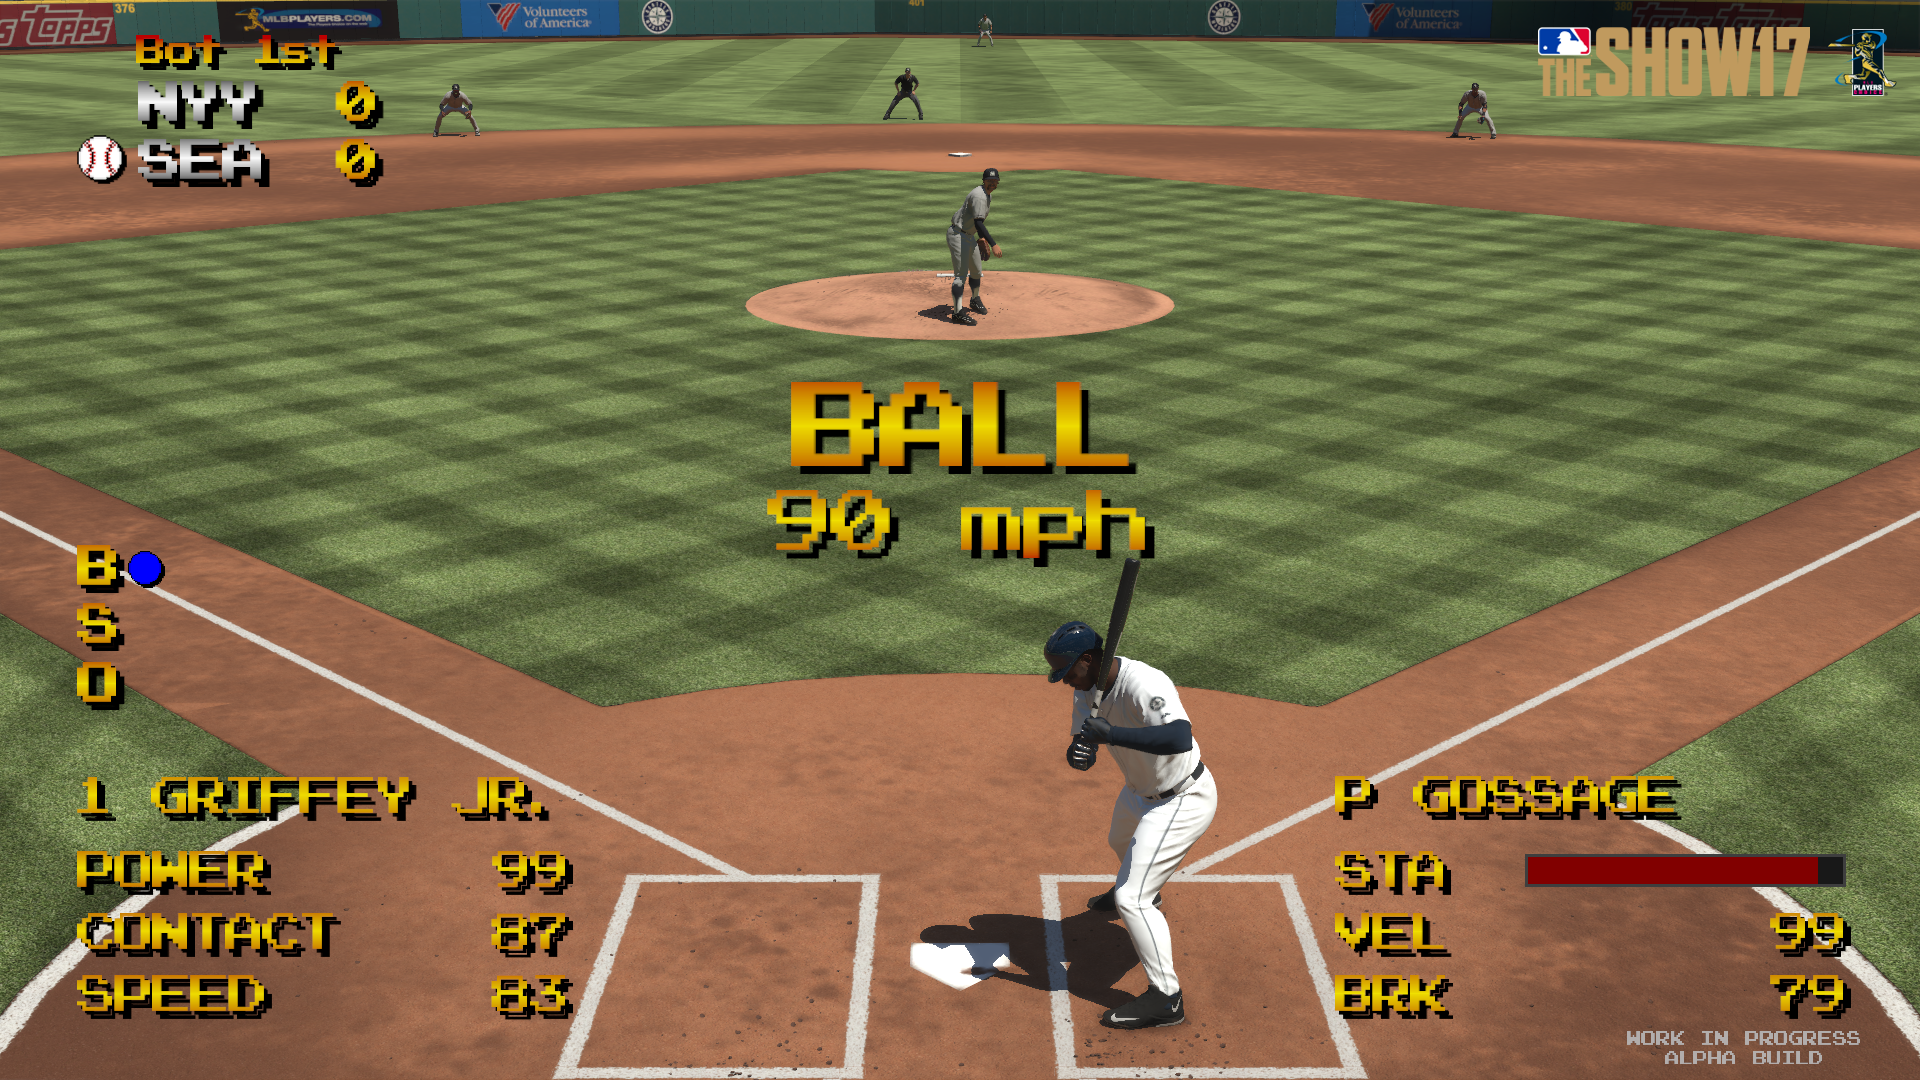 『MLB THE SHOW 17』ゲーム画面